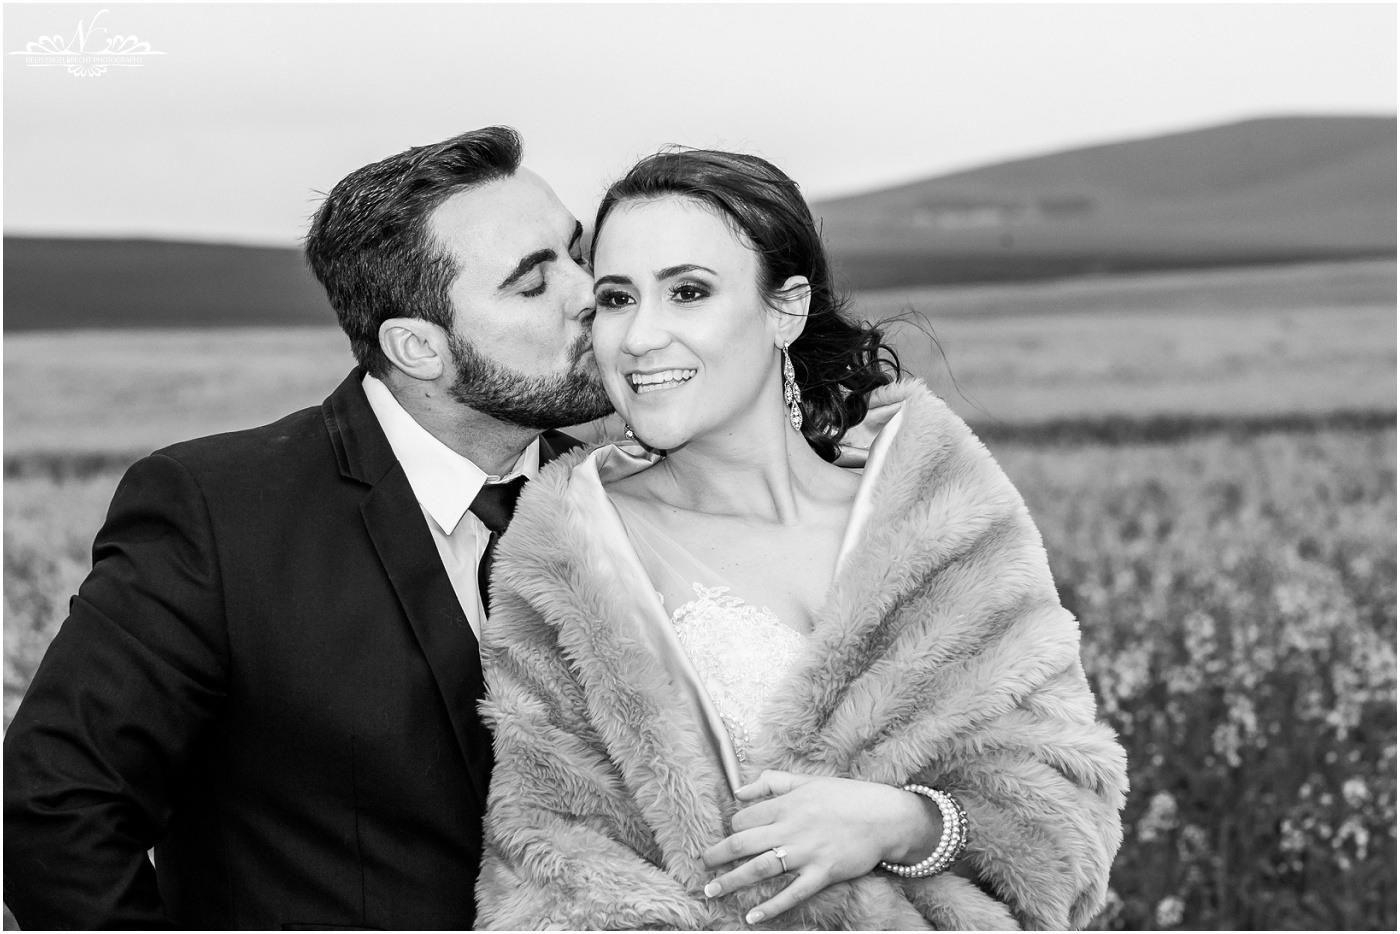 Eensgezind-Wedding-Photos-Nelis-Engelbrecht-Photography-155